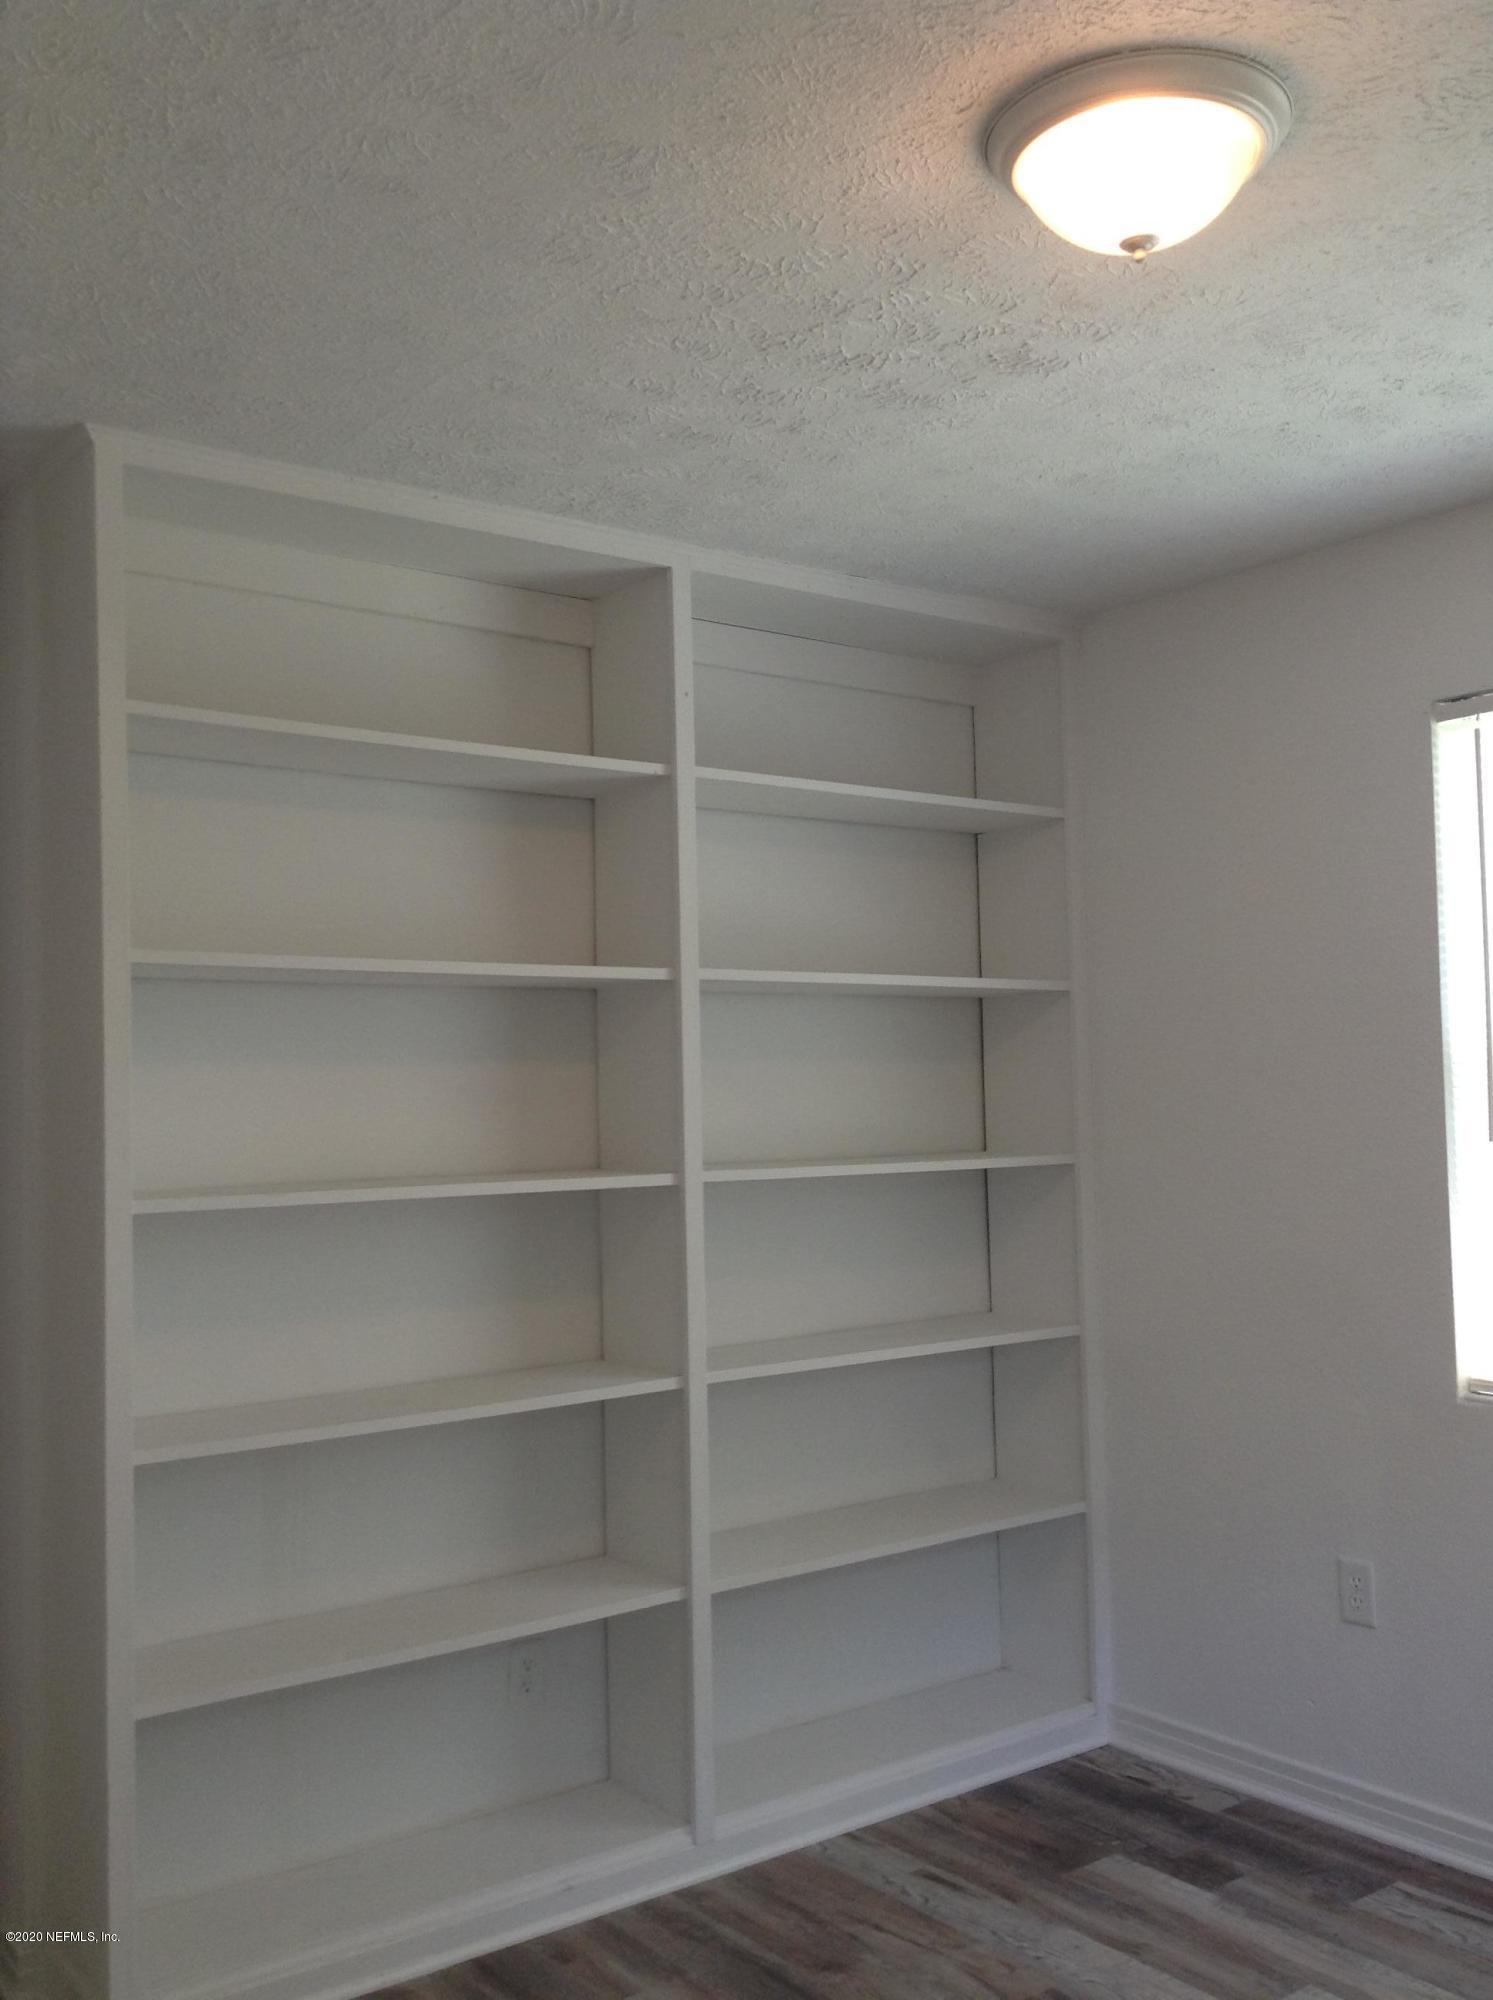 2610 ROGERO, JACKSONVILLE, FLORIDA 32211, 3 Bedrooms Bedrooms, ,2 BathroomsBathrooms,Residential,For sale,ROGERO,1074138